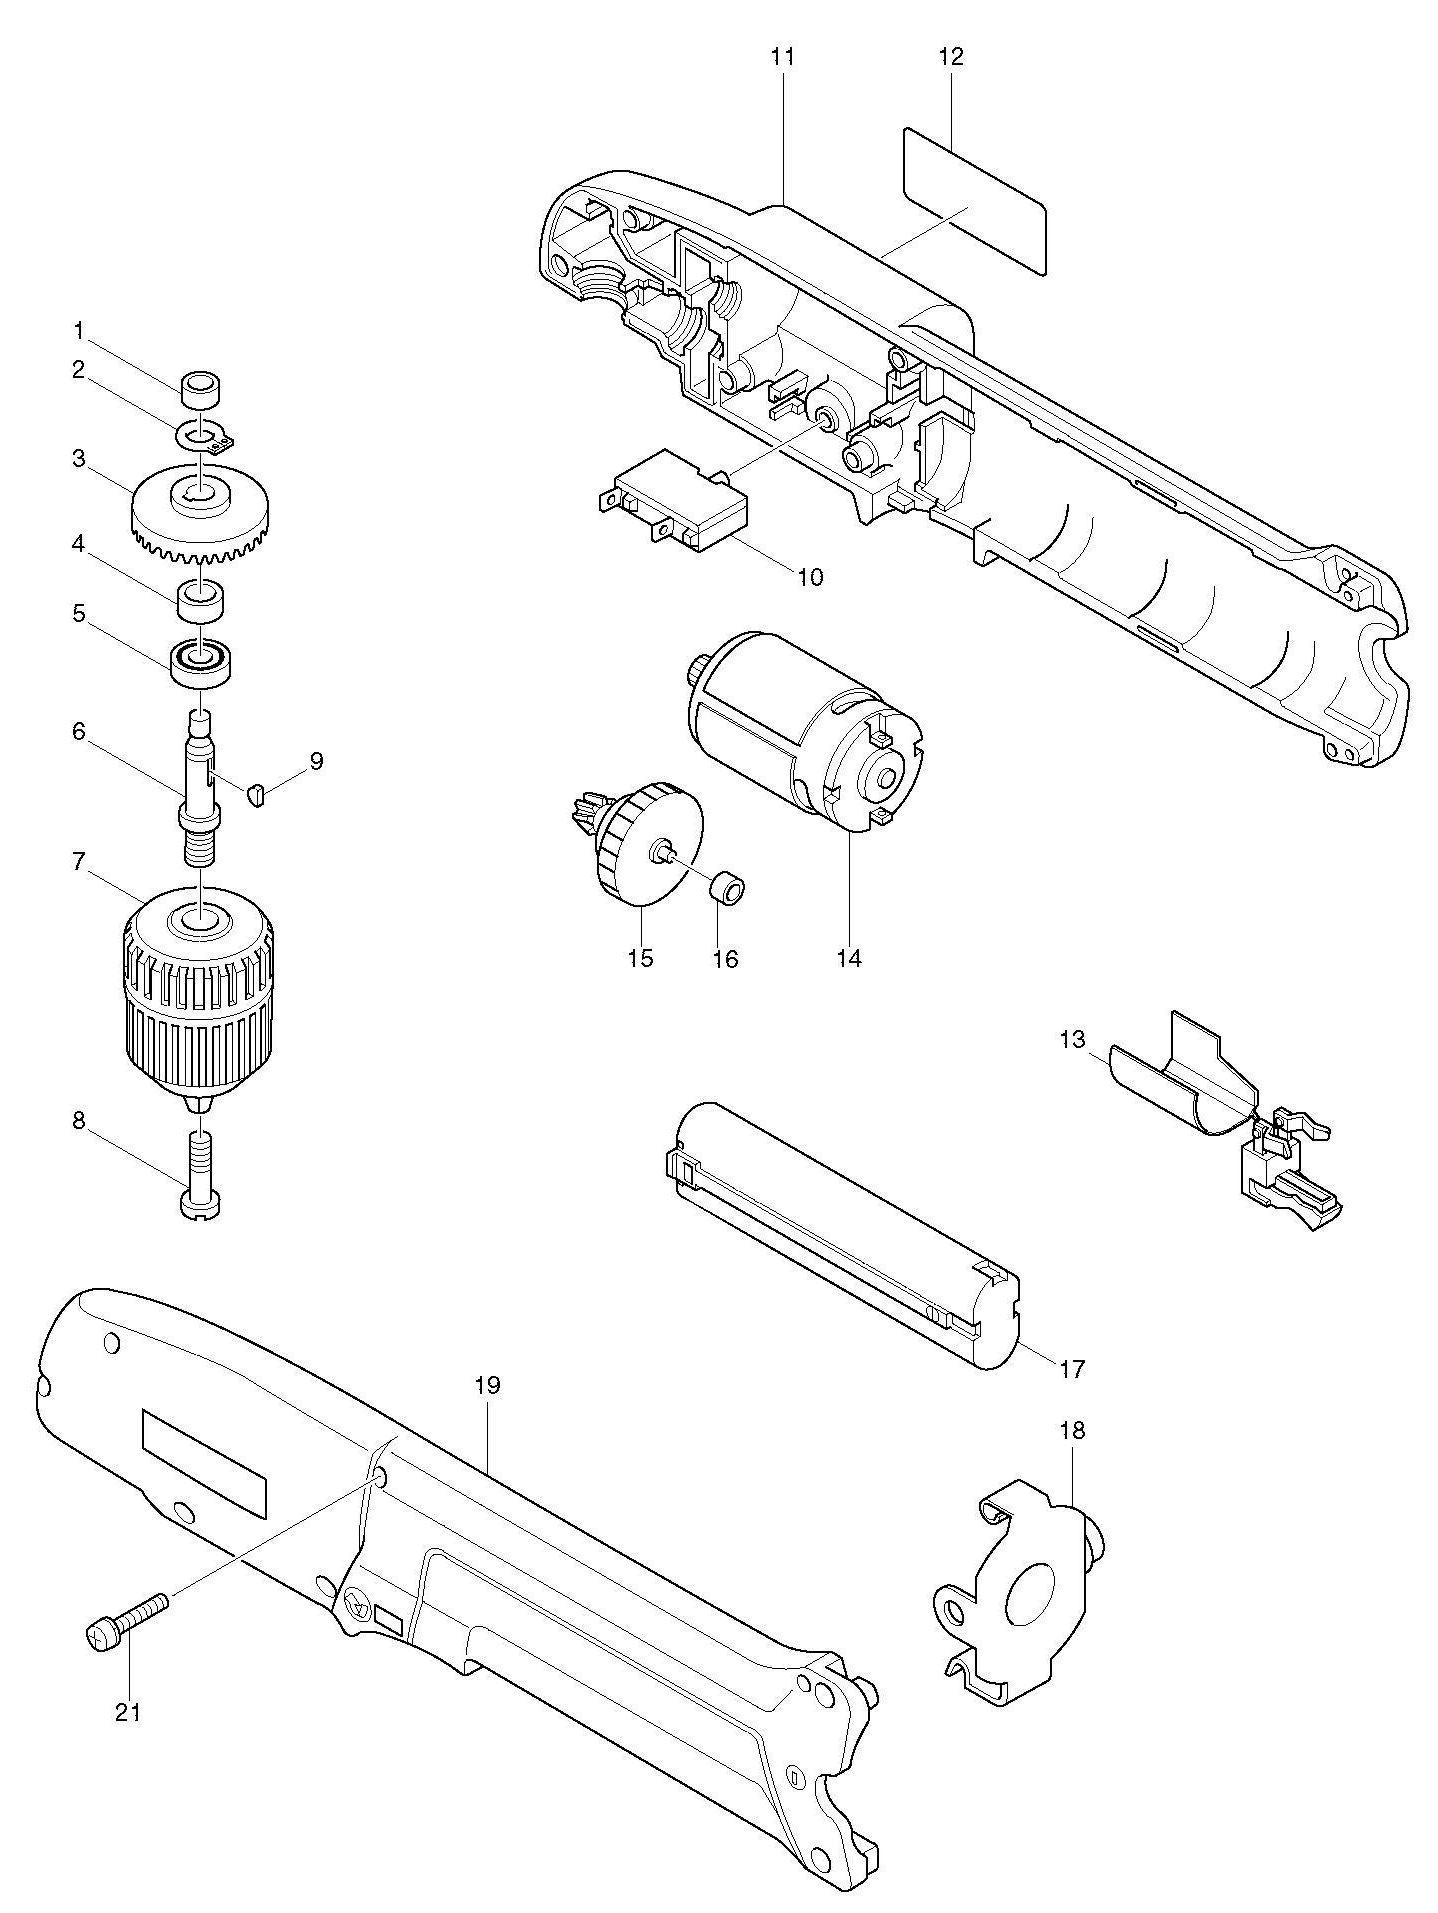 Spares for Makita Da391d Angle Drill SPARE_DA391D from